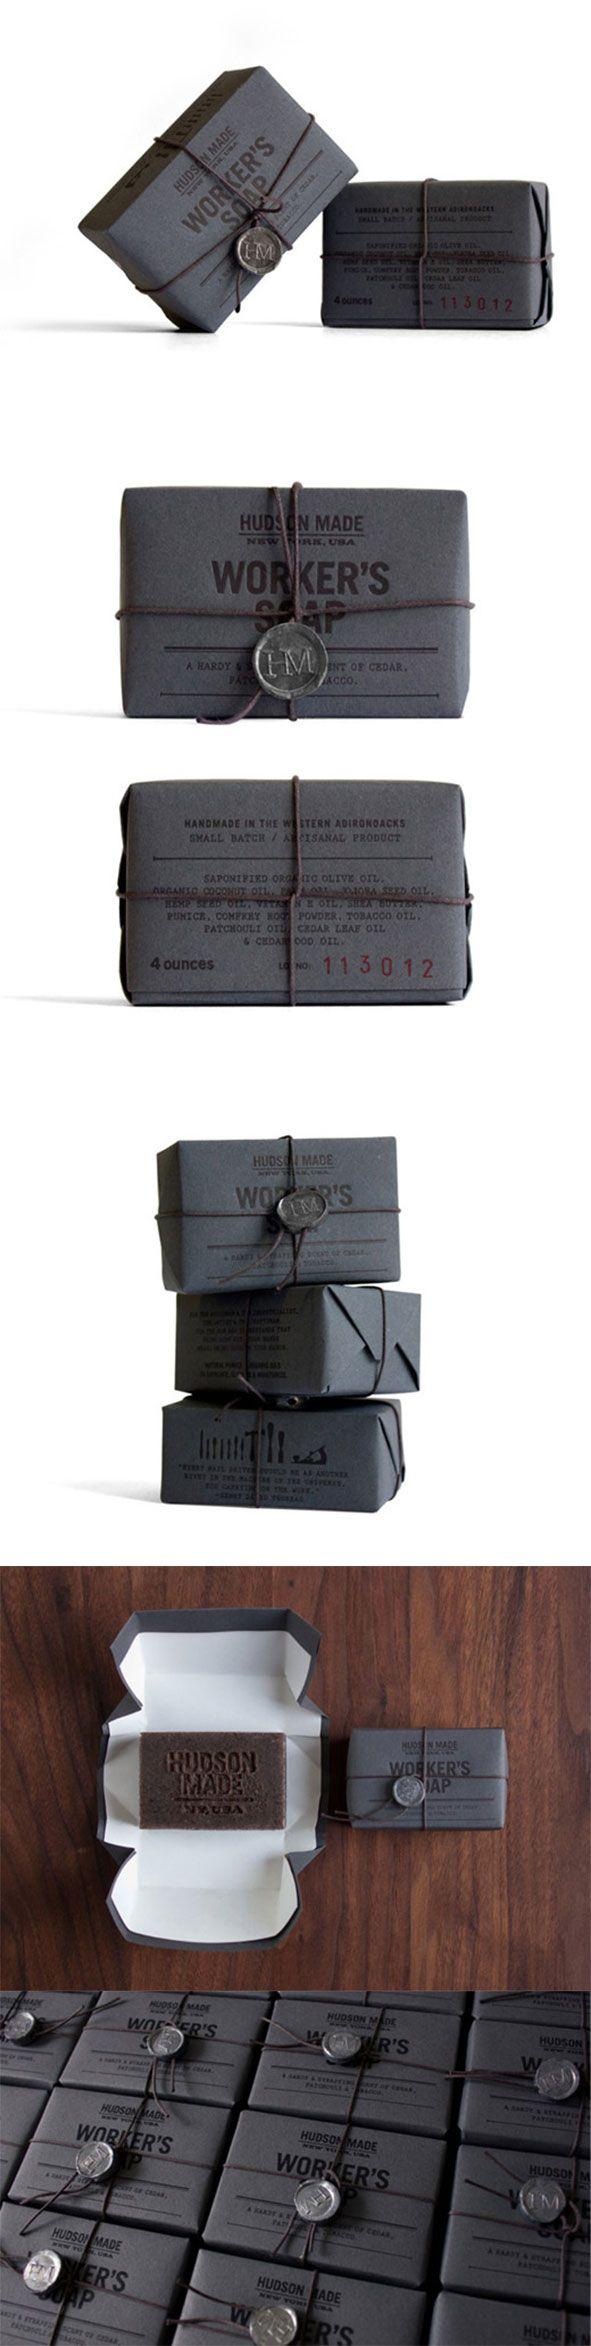 Hudson Made: Worker's Soap $16 #inspiration Torso Vertical Inspirations Blogging inspirational work, a visual source for Torso Vertical. Connect with Torso Vertical Branding, advertising & Illustration www.facebook.com/TorsoVerticalDesign @torsovertical www.torsovertical.com